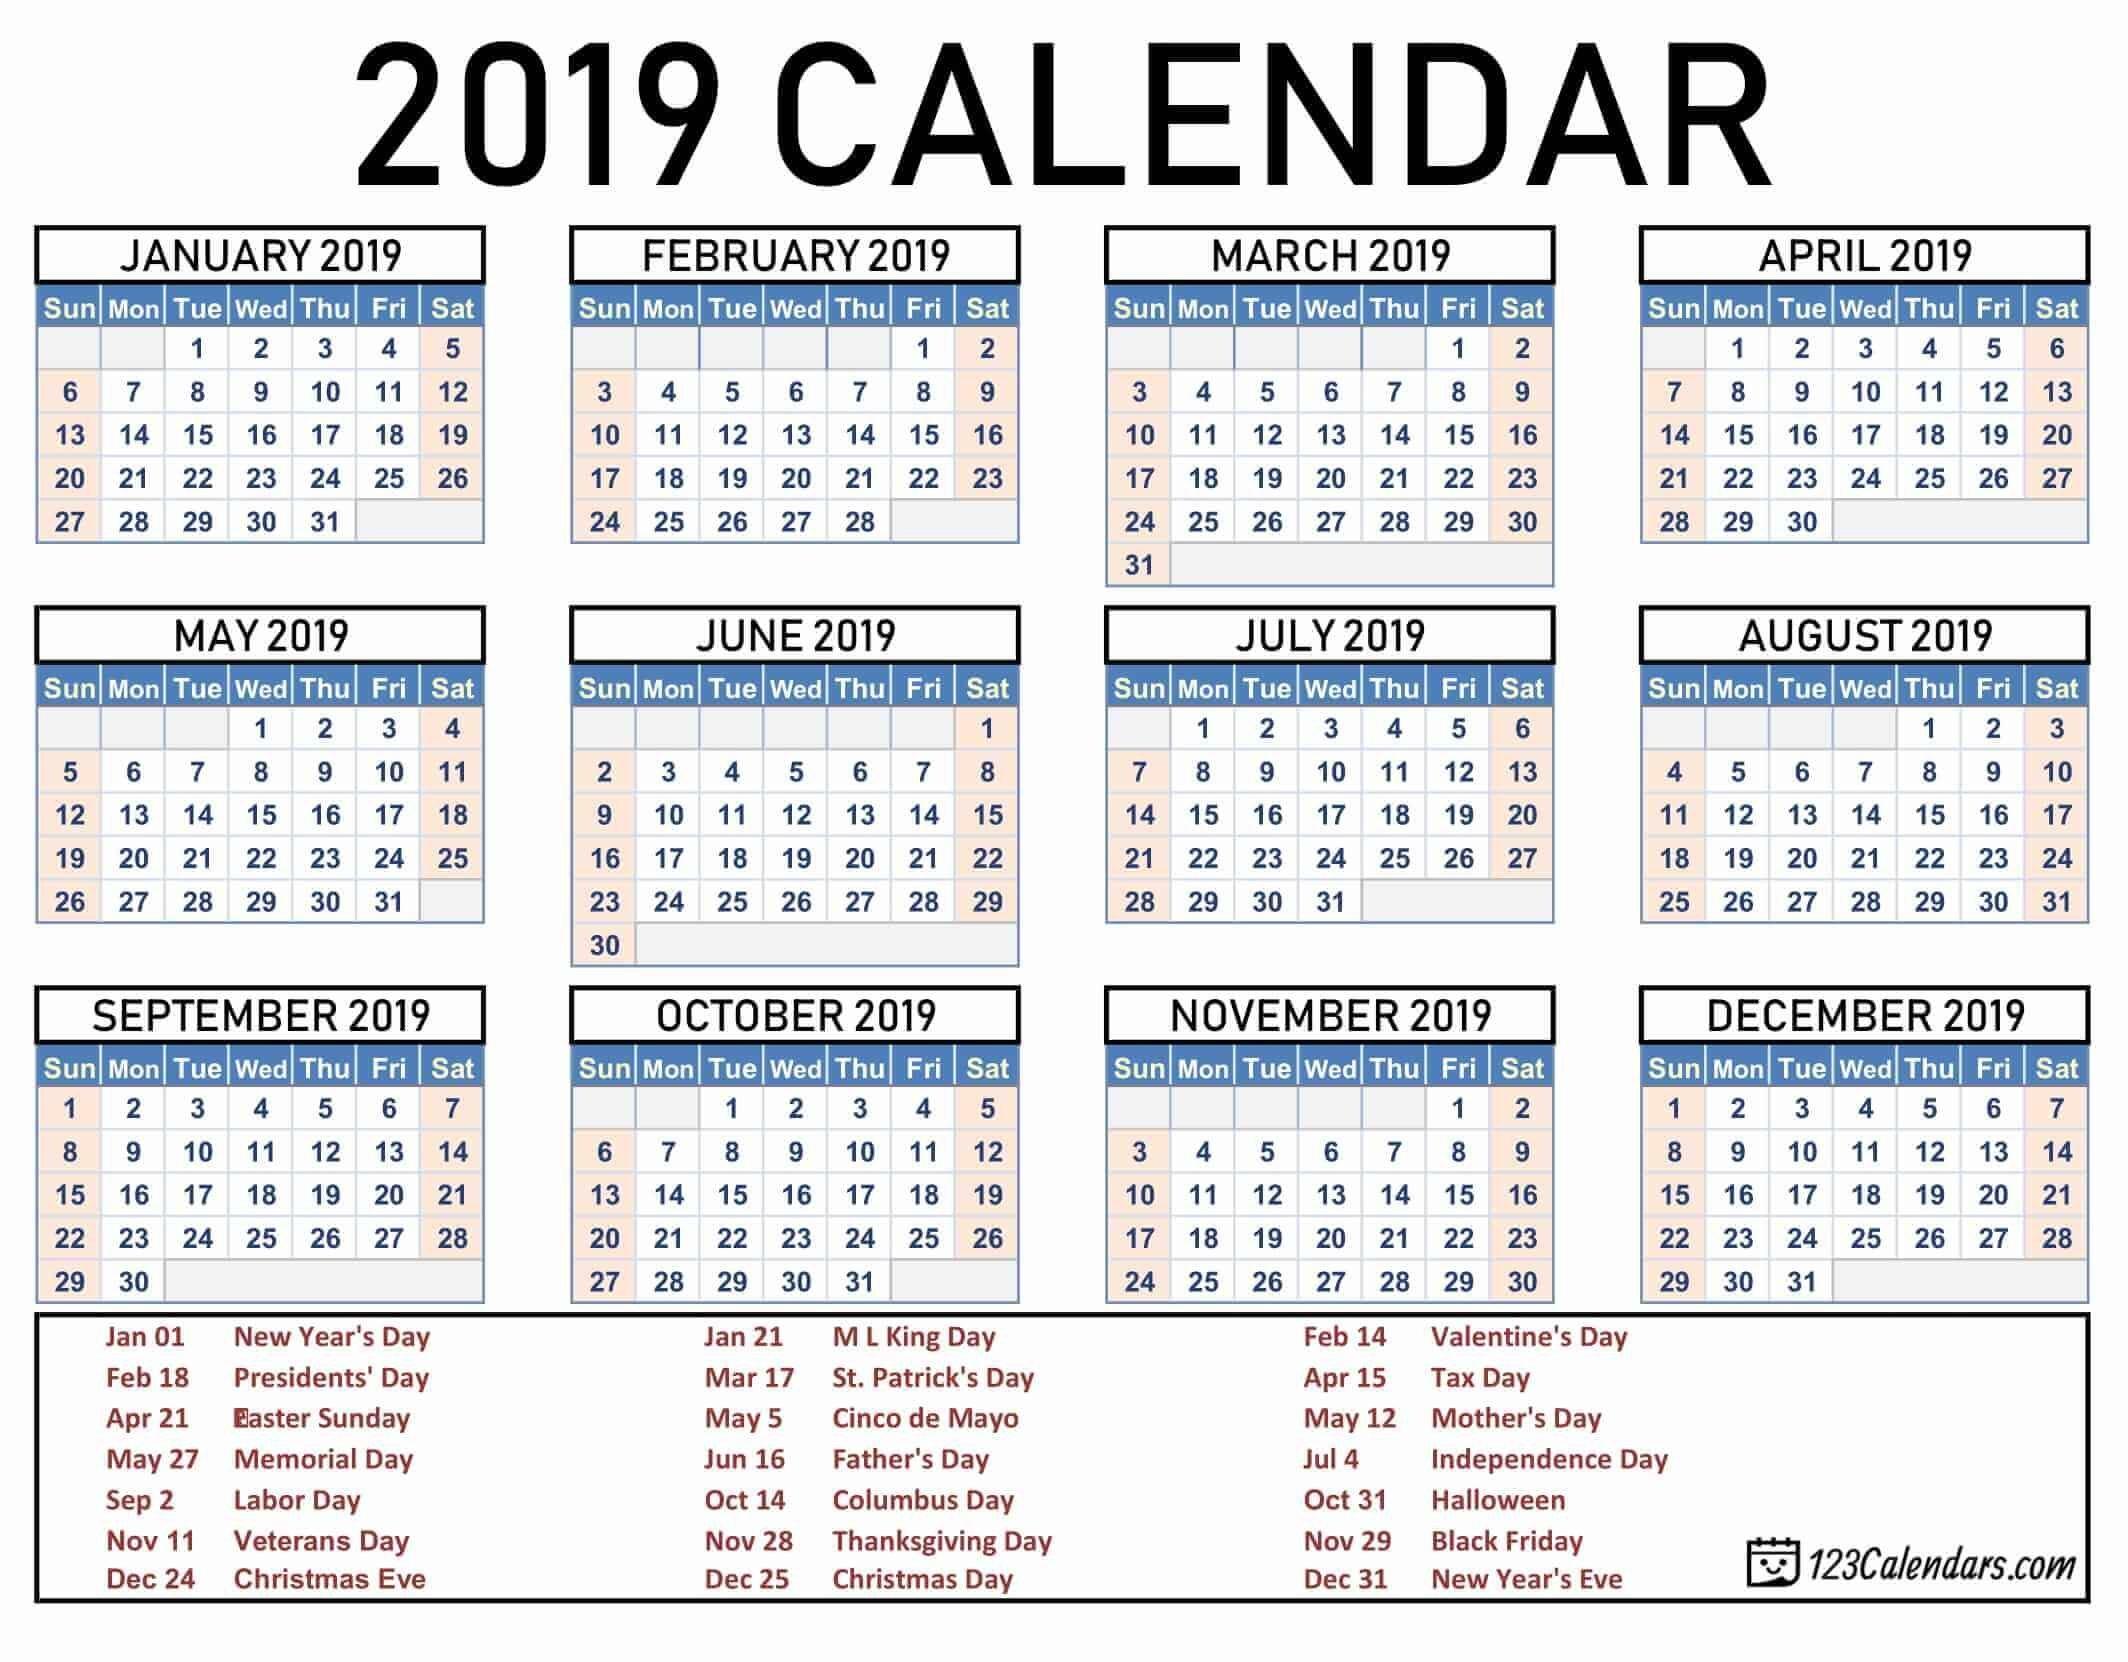 Year 2019 Printable Calendar Templates - 123Calendars Calendar 4 2019